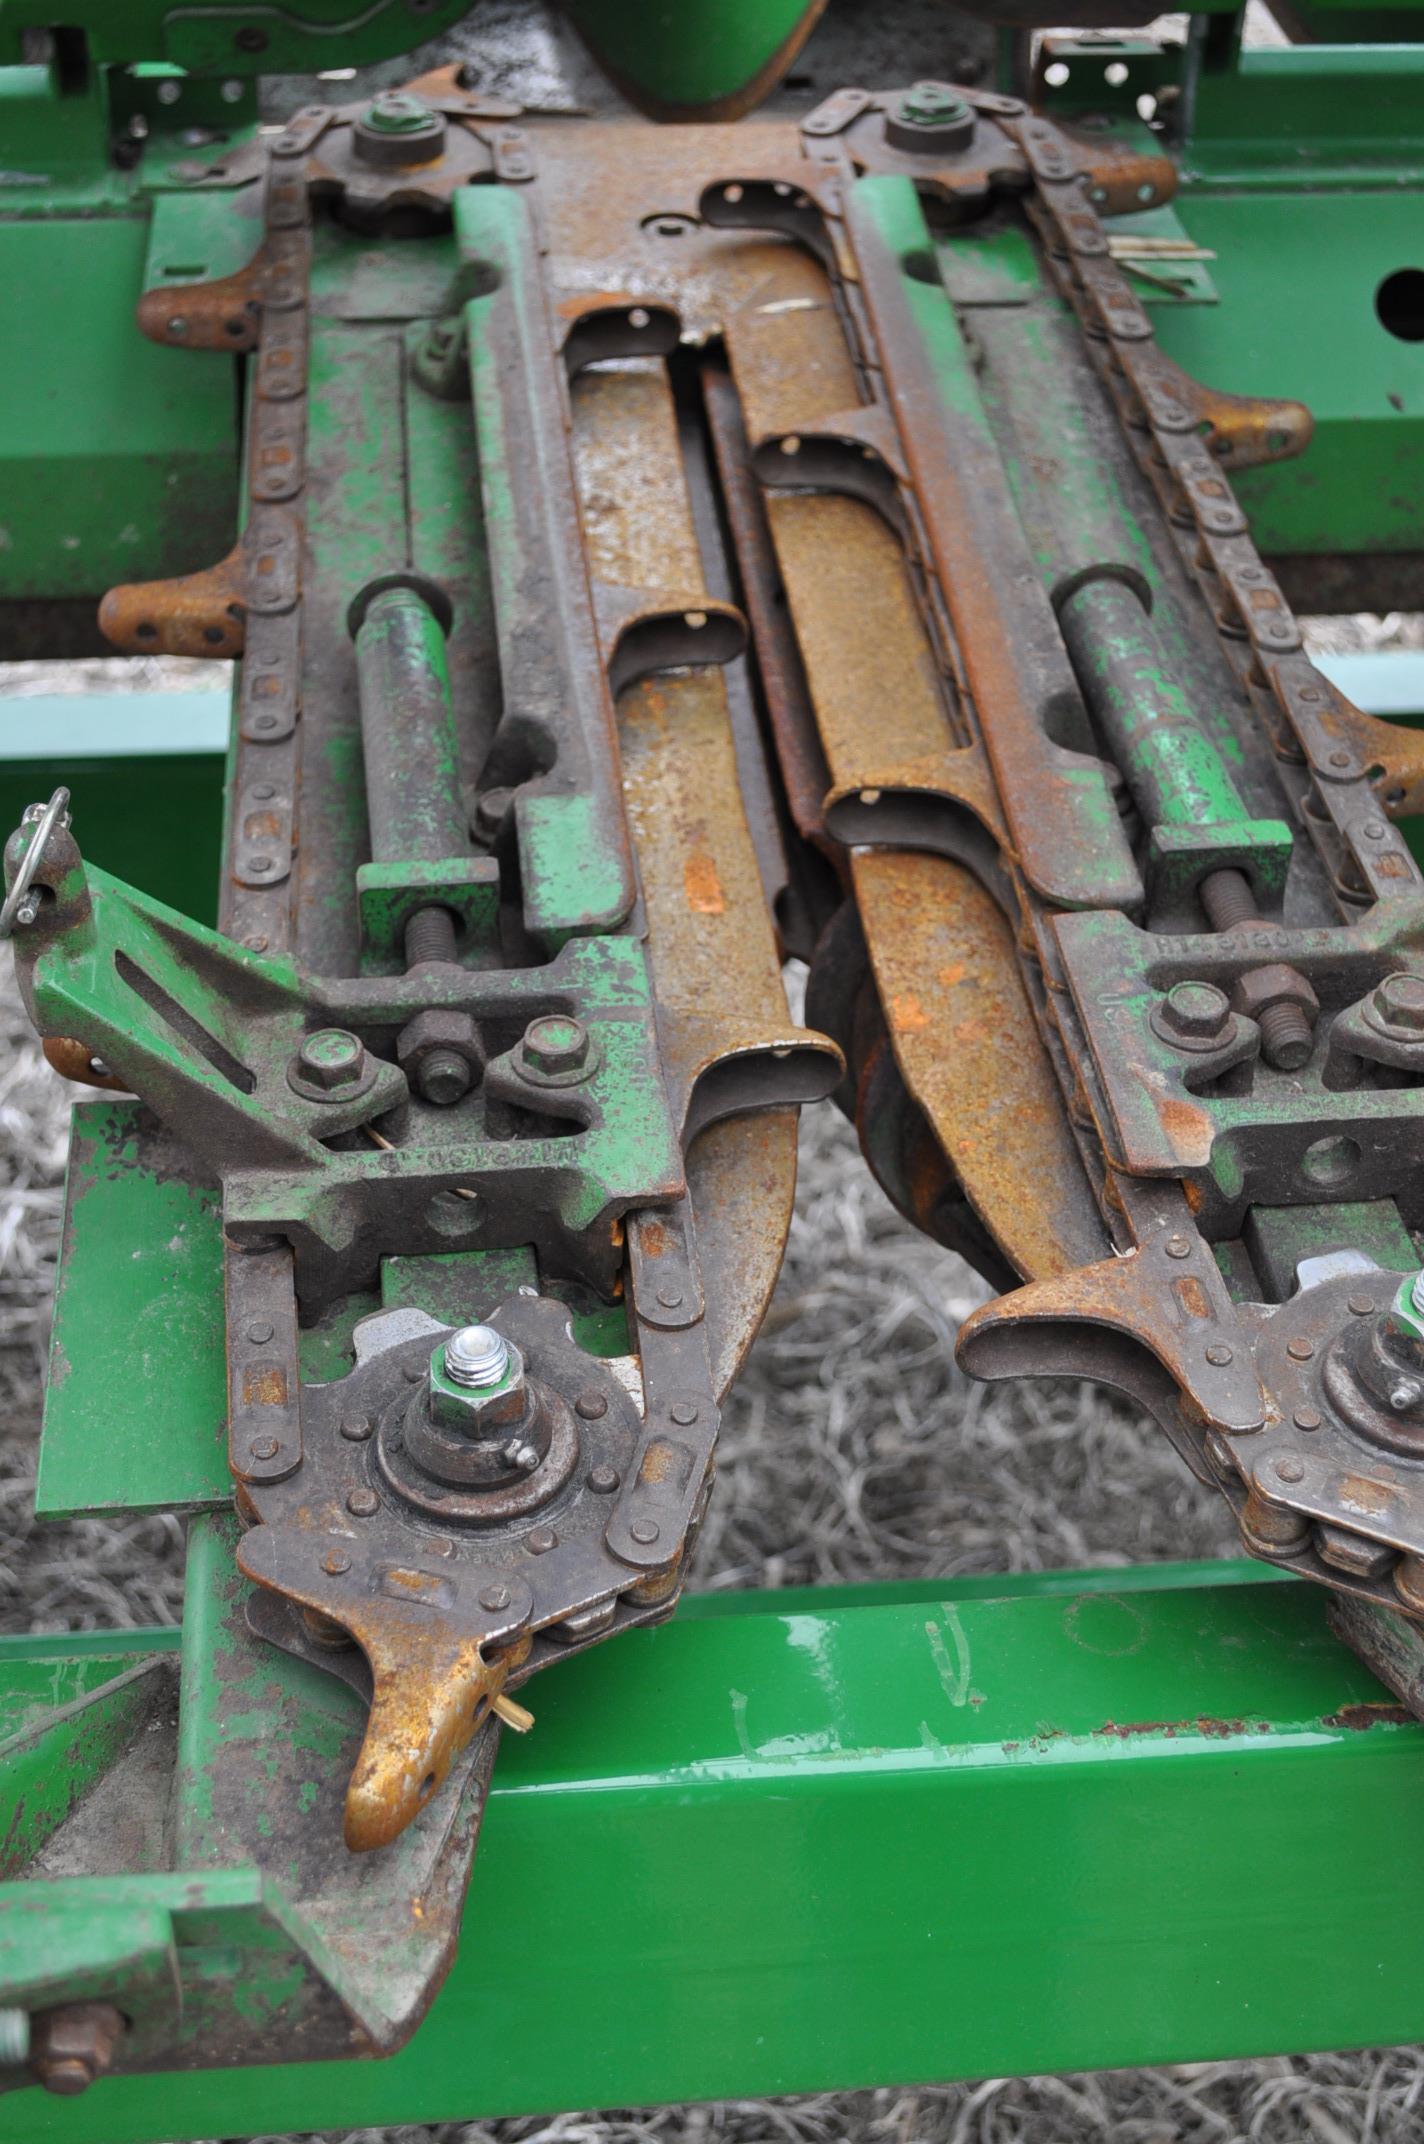 John Deere 693 corn head, poly, hyd drive, down corn reel, pto shafts, SN 655654 - Image 12 of 17